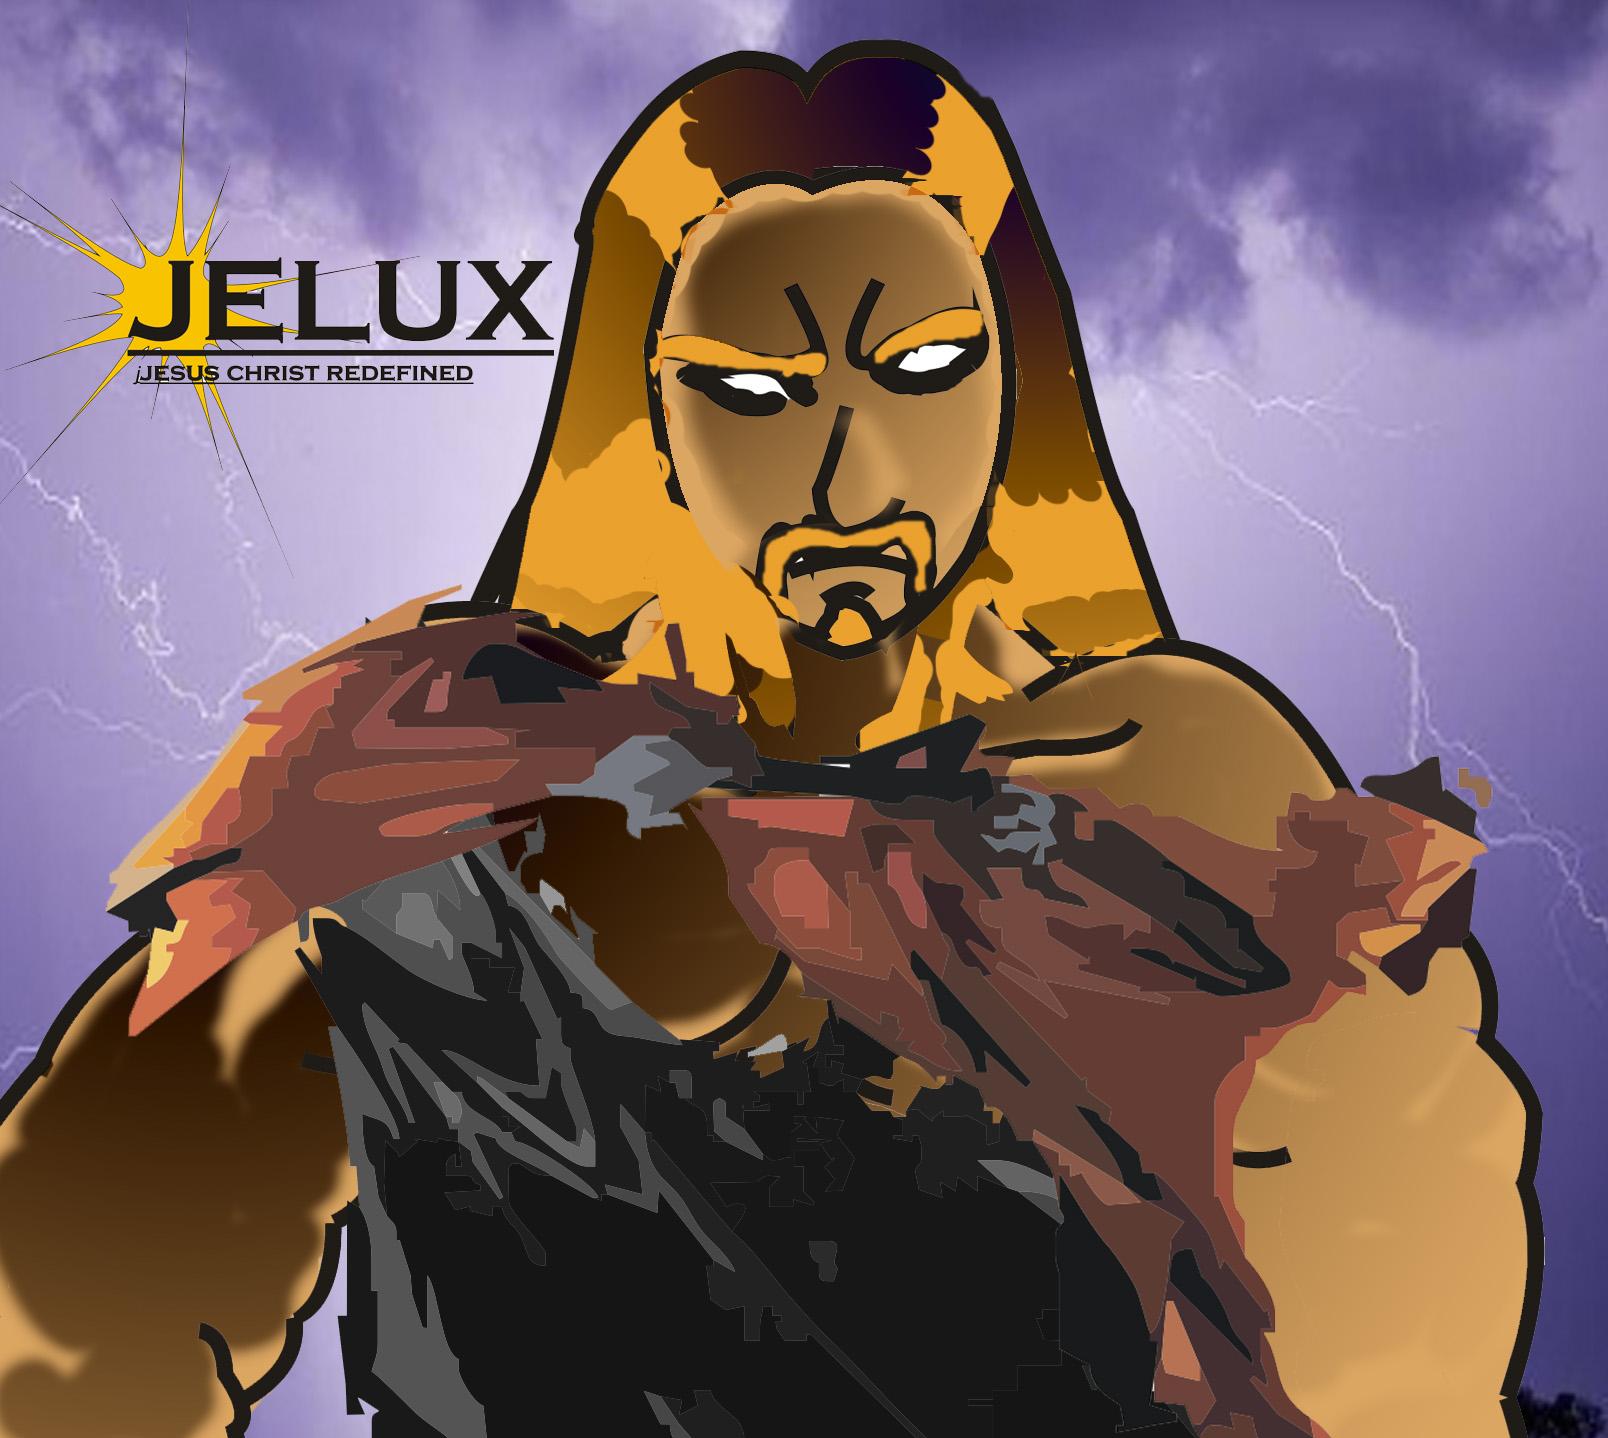 CH01 - Jelux: Jesus Redefined